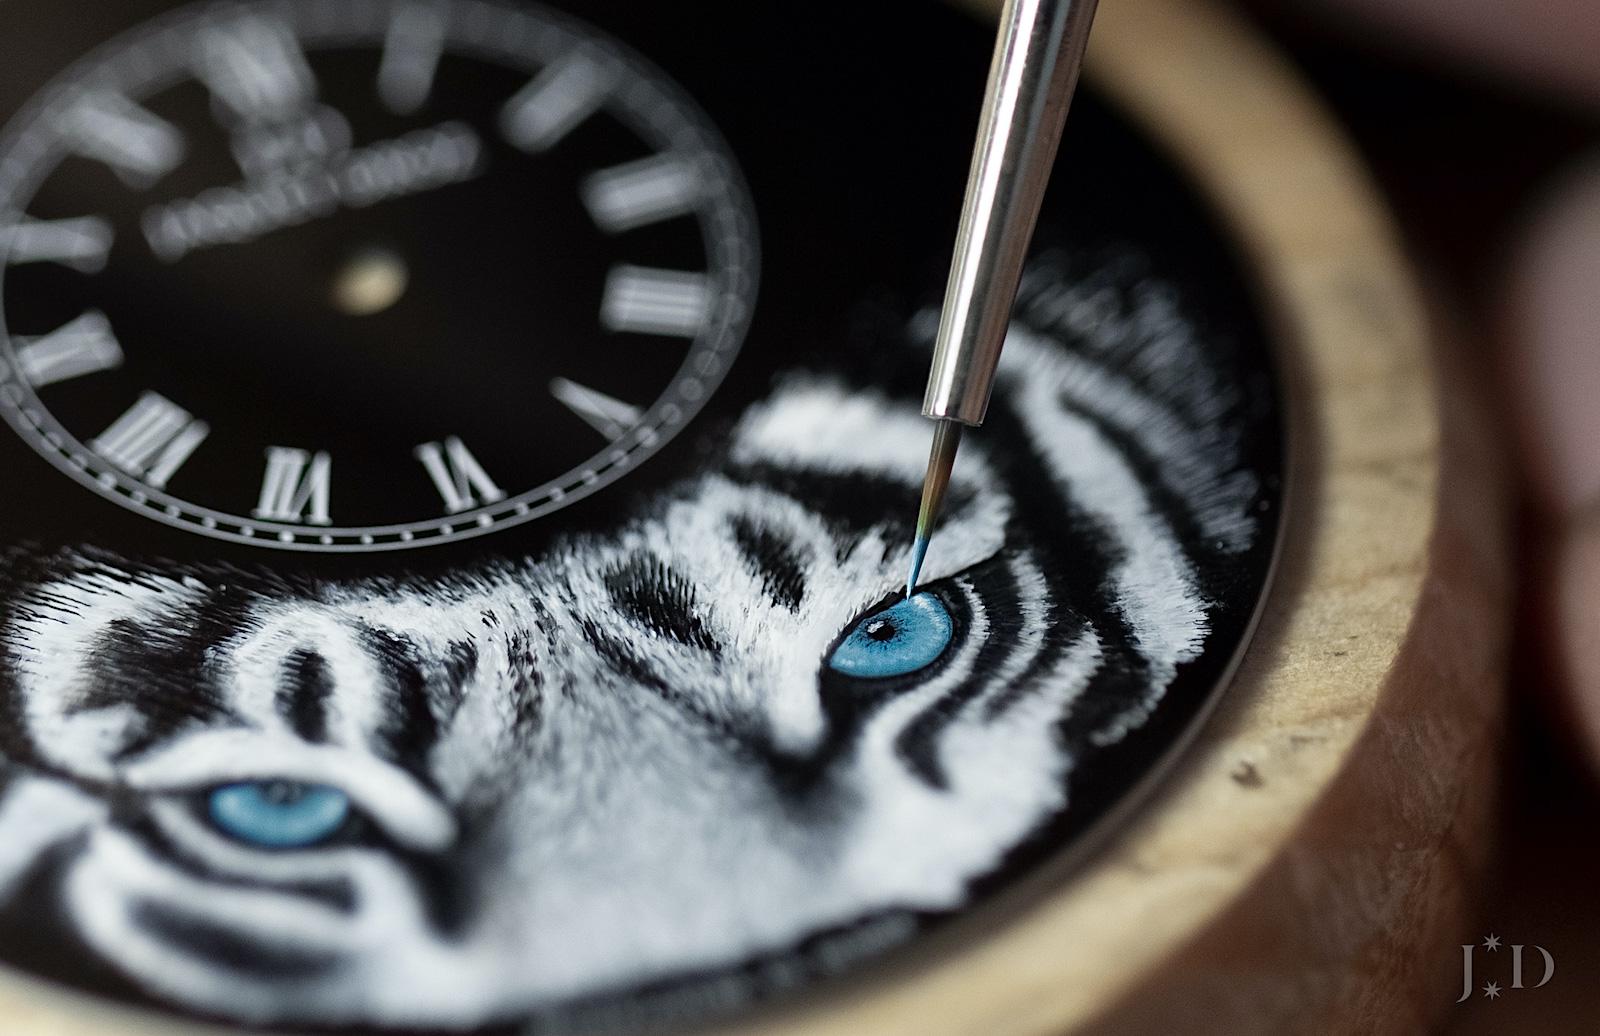 Jaquet Droz Petite Heure Minute Tiger - pintura